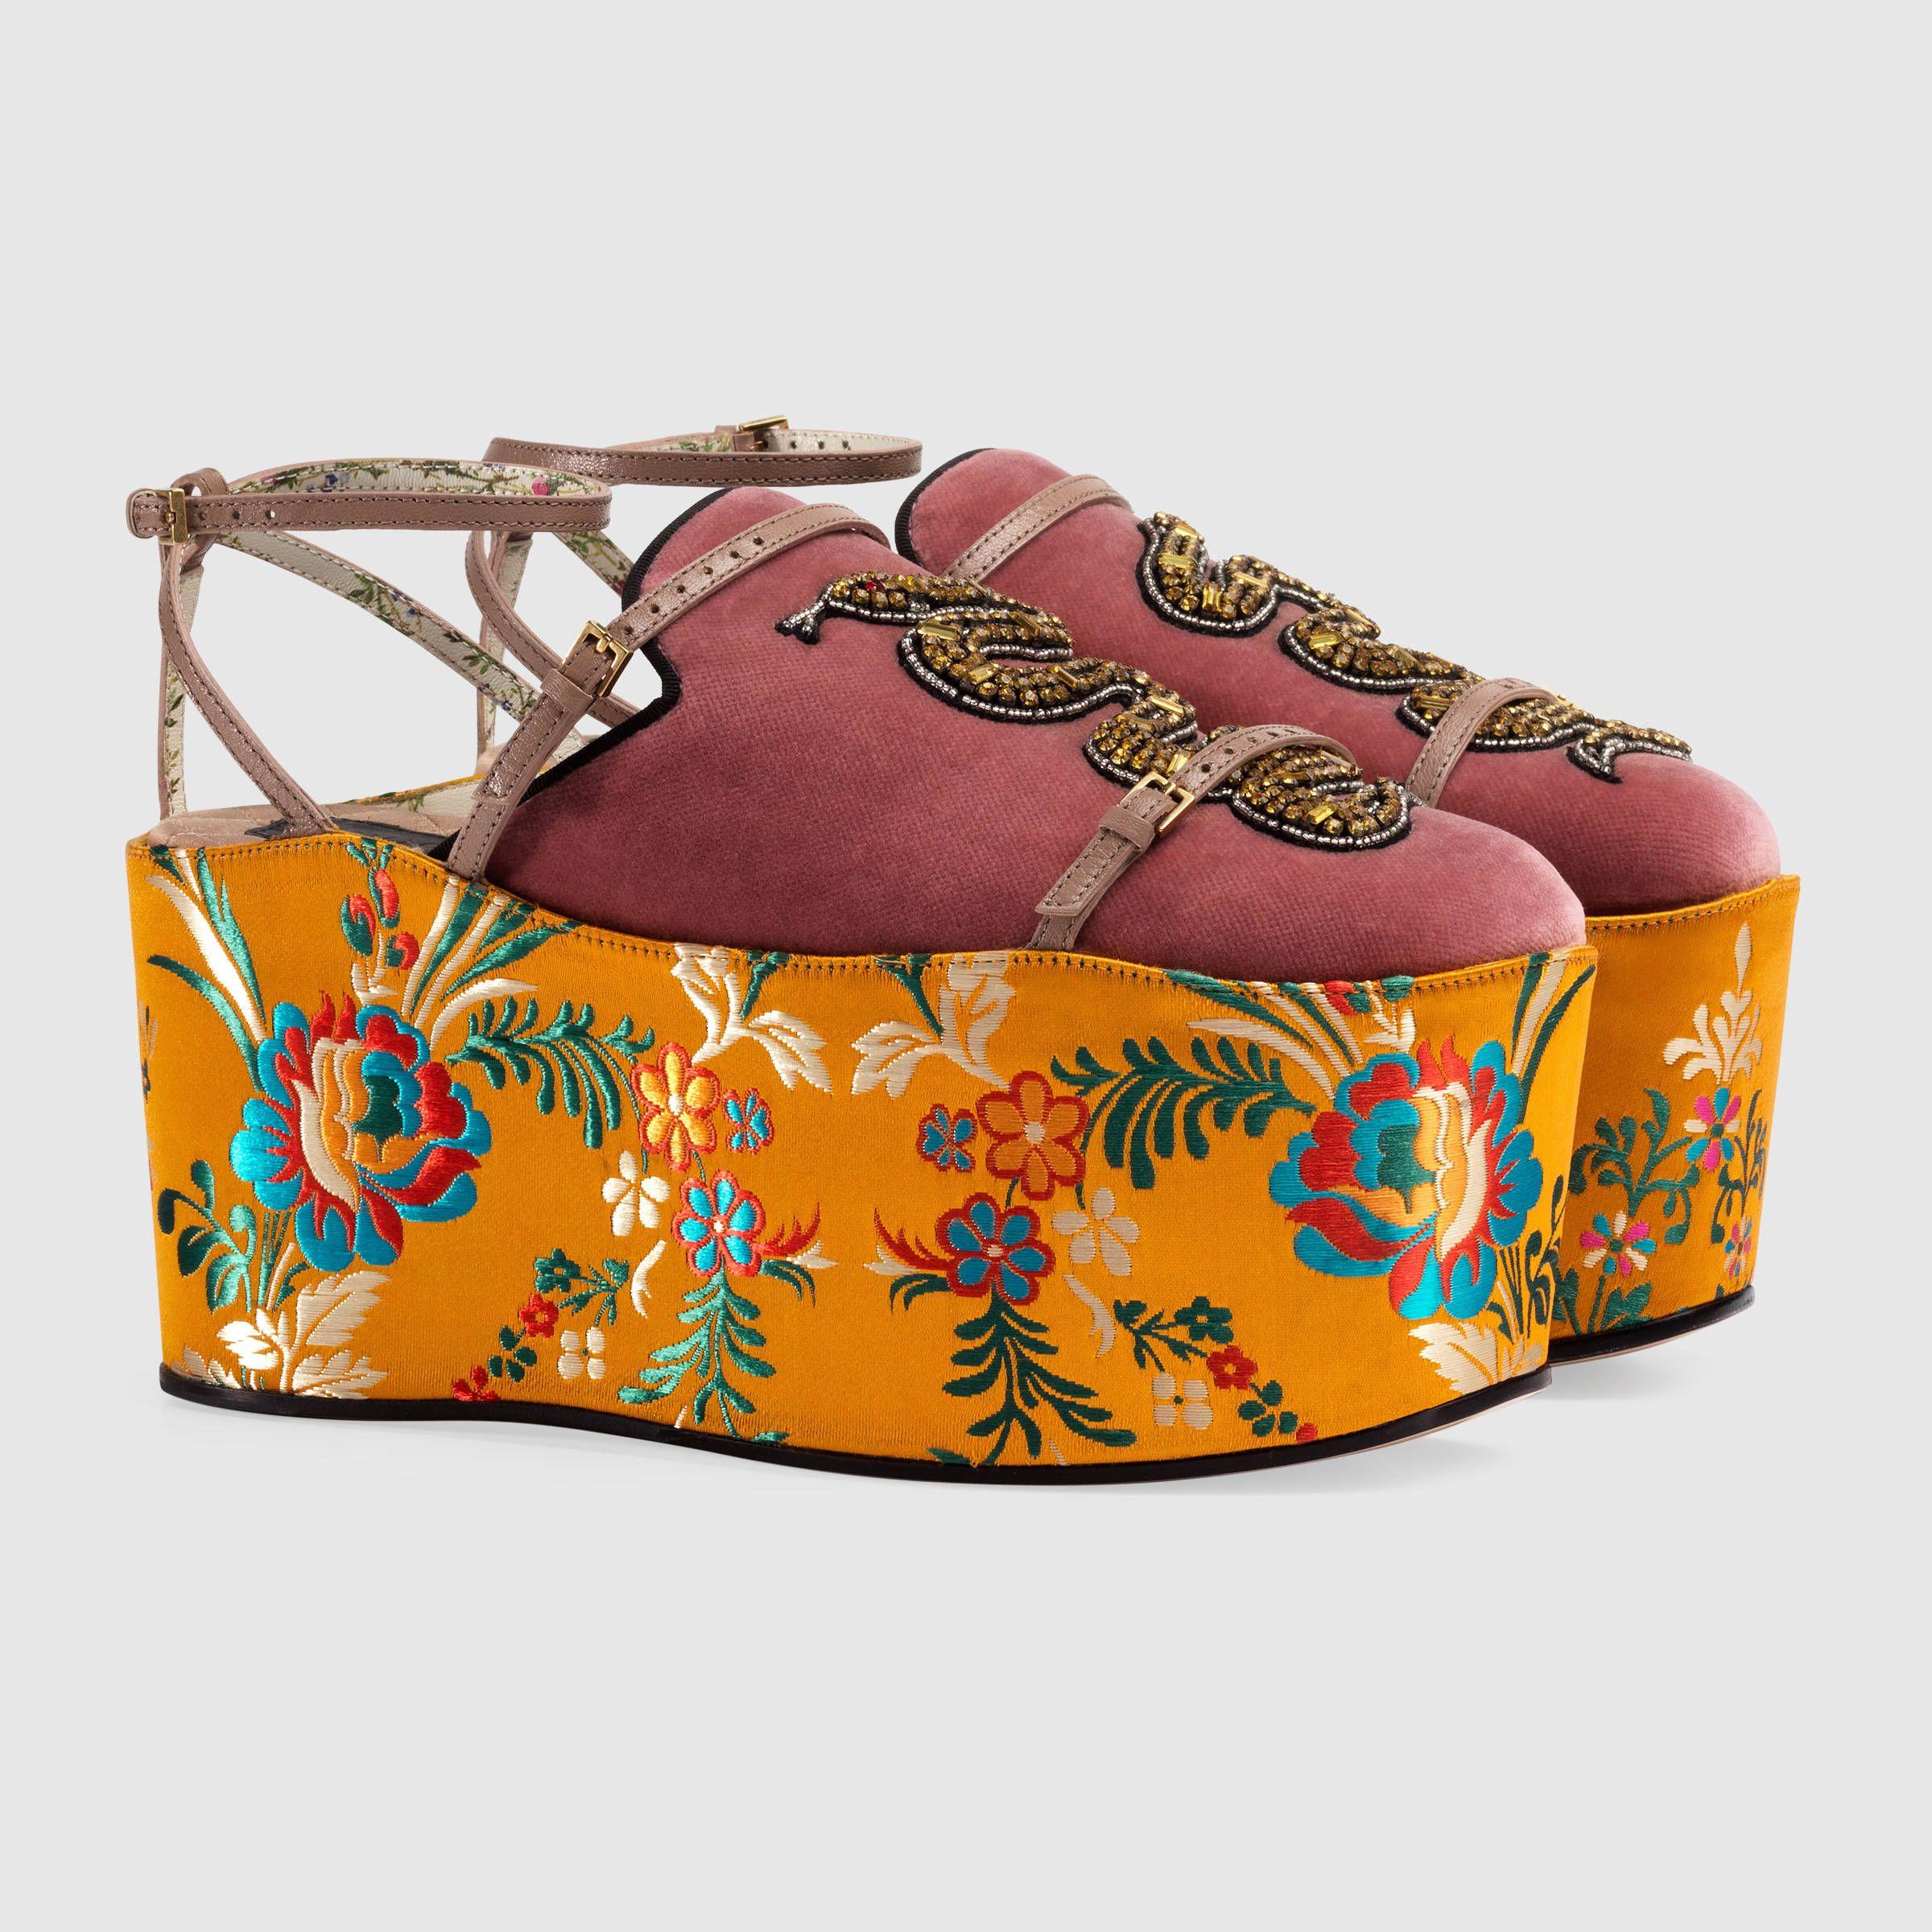 dfdad691a9f Velvet slipper with removable platform - Gucci Women s Slides   Mules  470435FASN06474